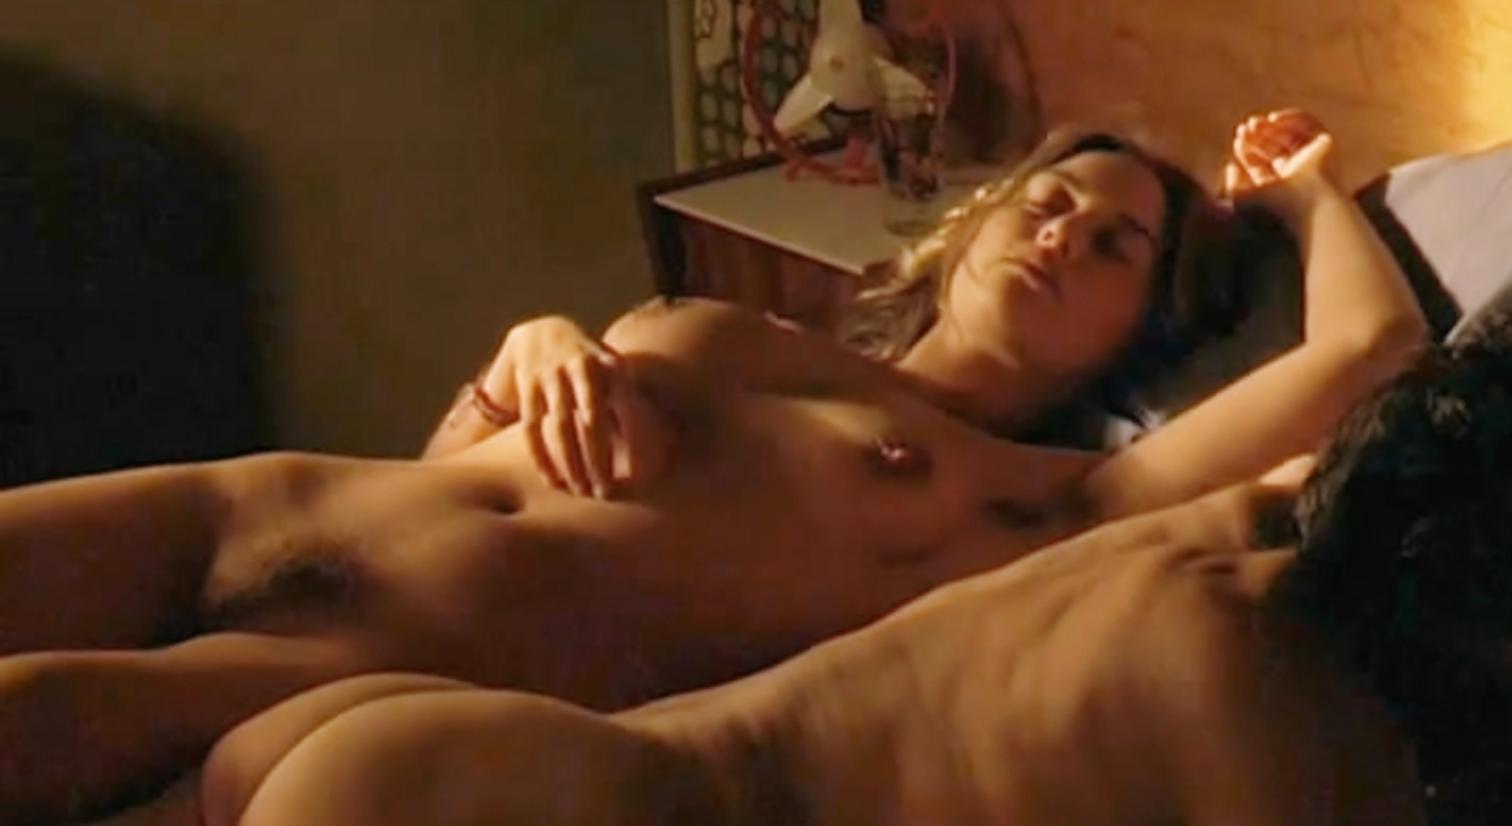 eroticheskiy-film-molodost